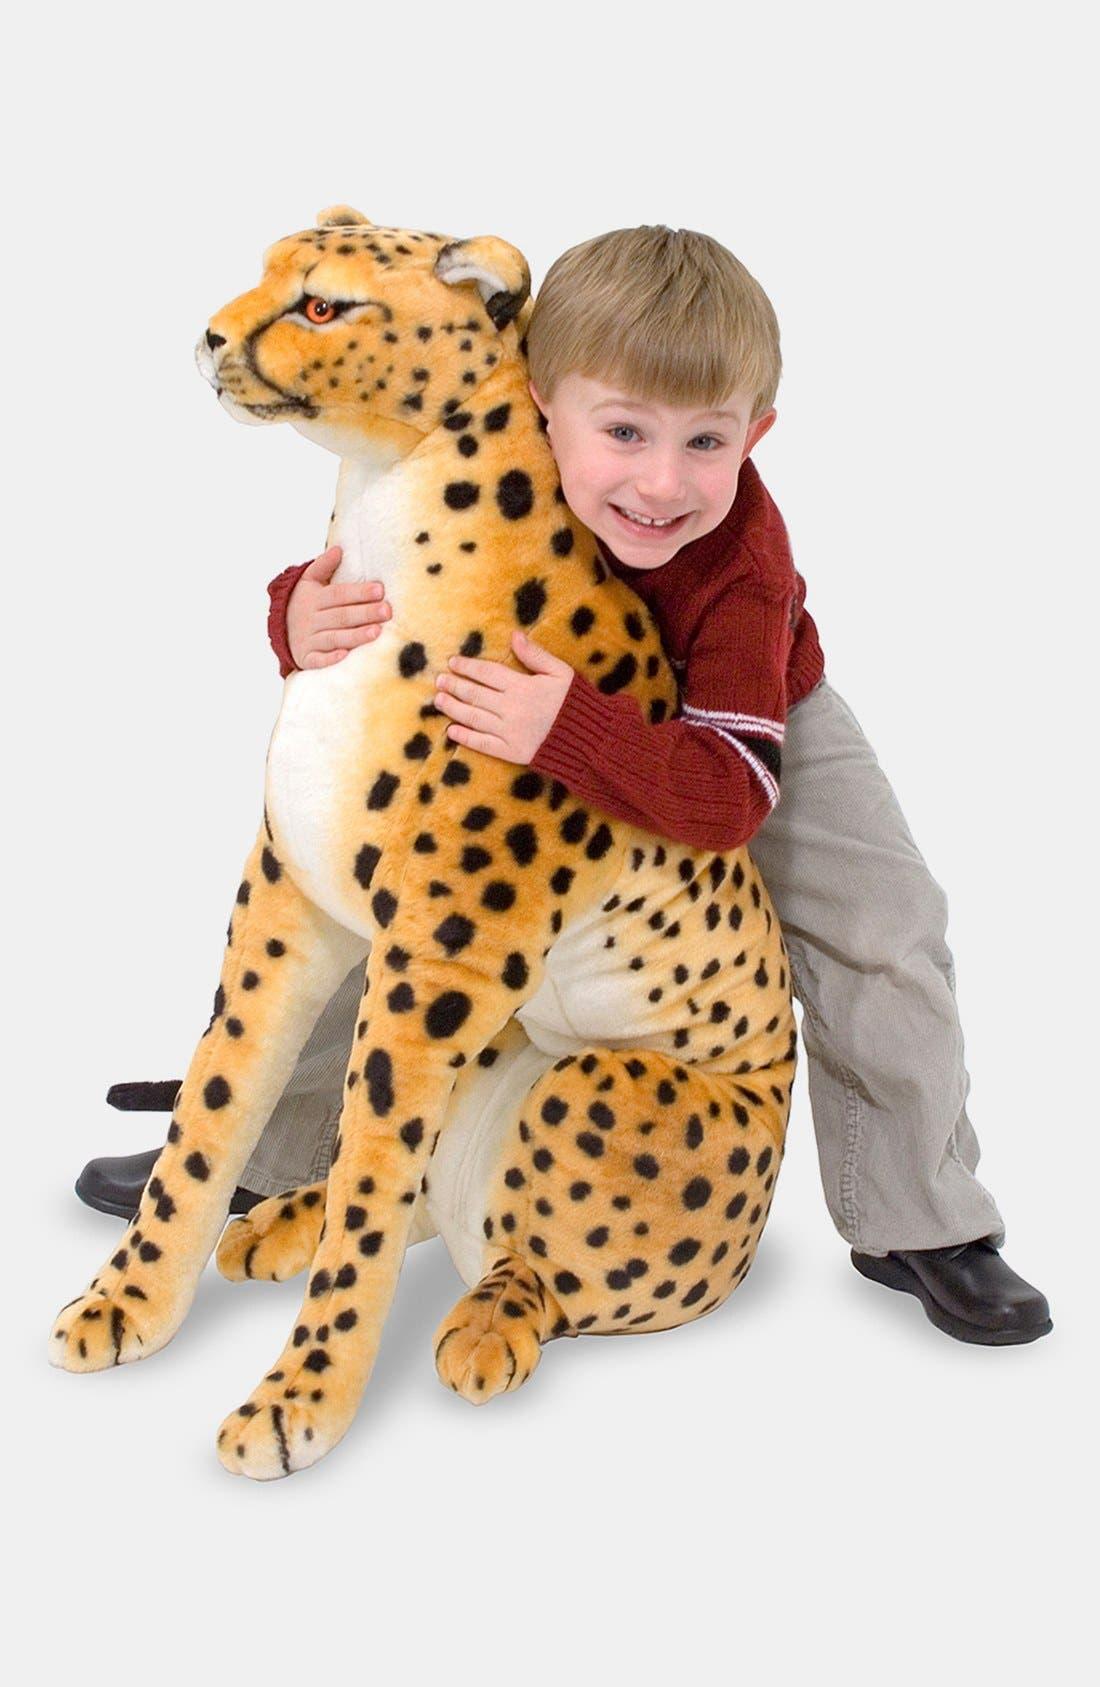 Alternate Image 1 Selected - Melissa & Doug Plush Cheetah Stuffed Animal